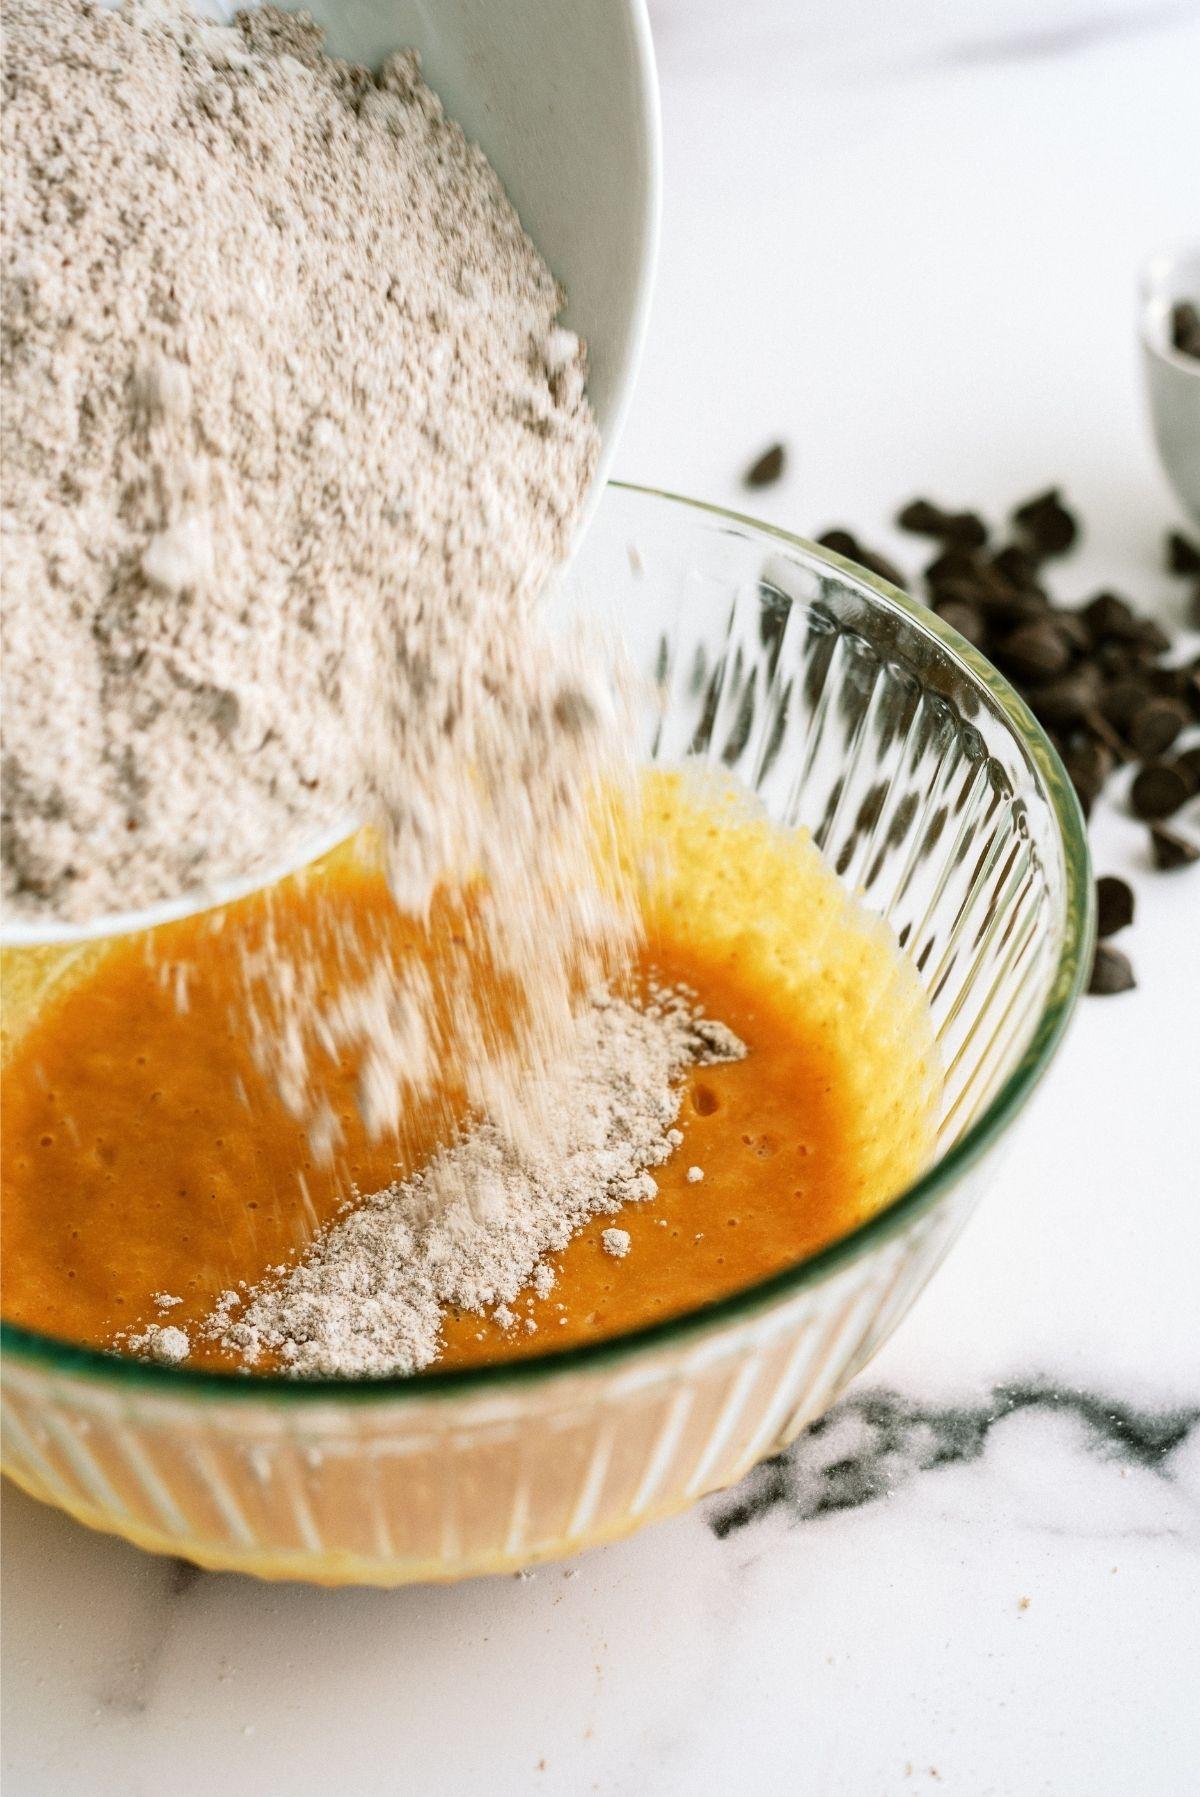 Adding dry ingredients into wet ingredients